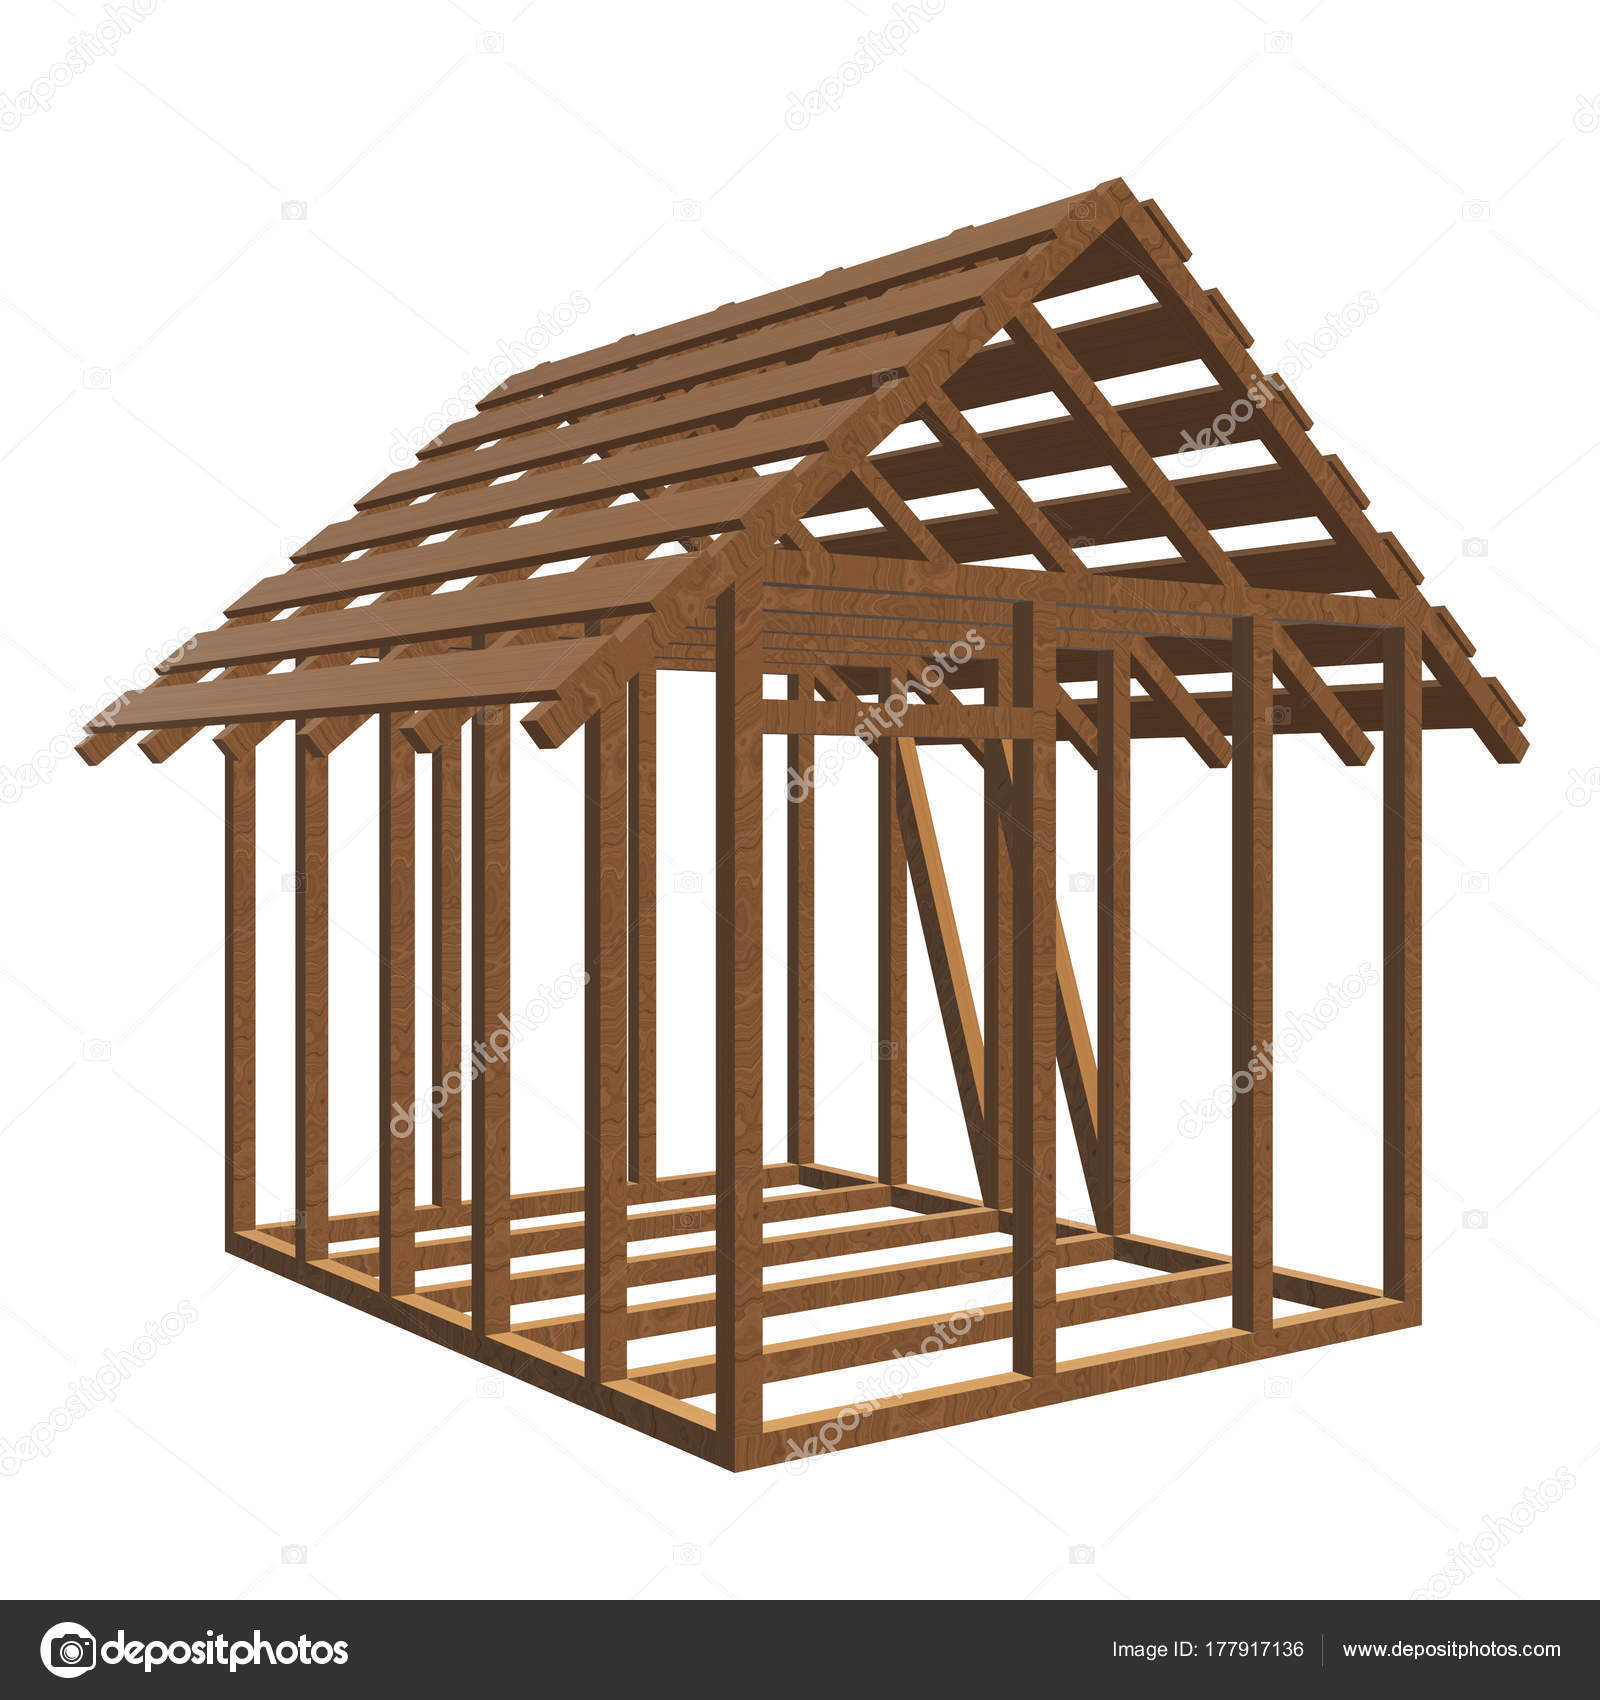 Aus Holz Framing Haus — Stockfoto © newb1 #177917136